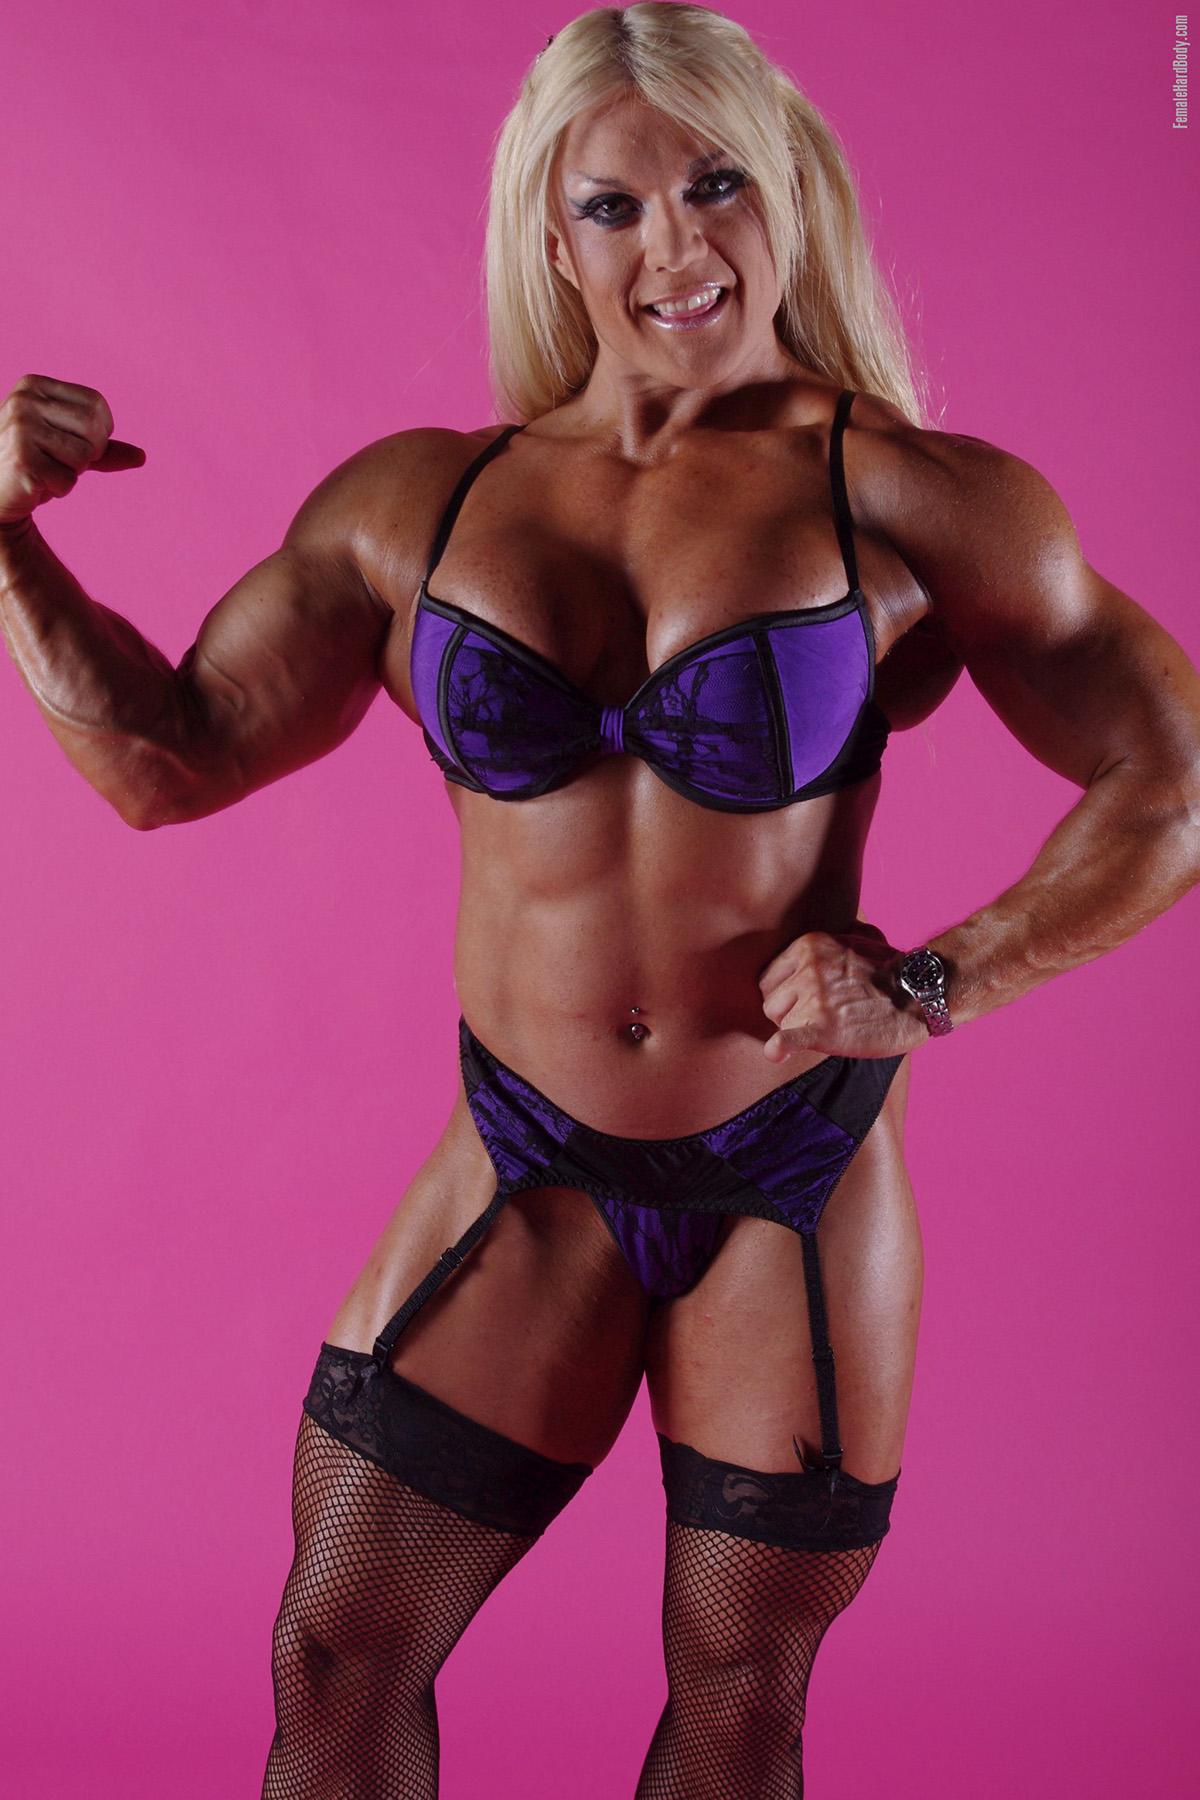 Female Hard Body - Lisa Cross stripping out of a sexy bikini